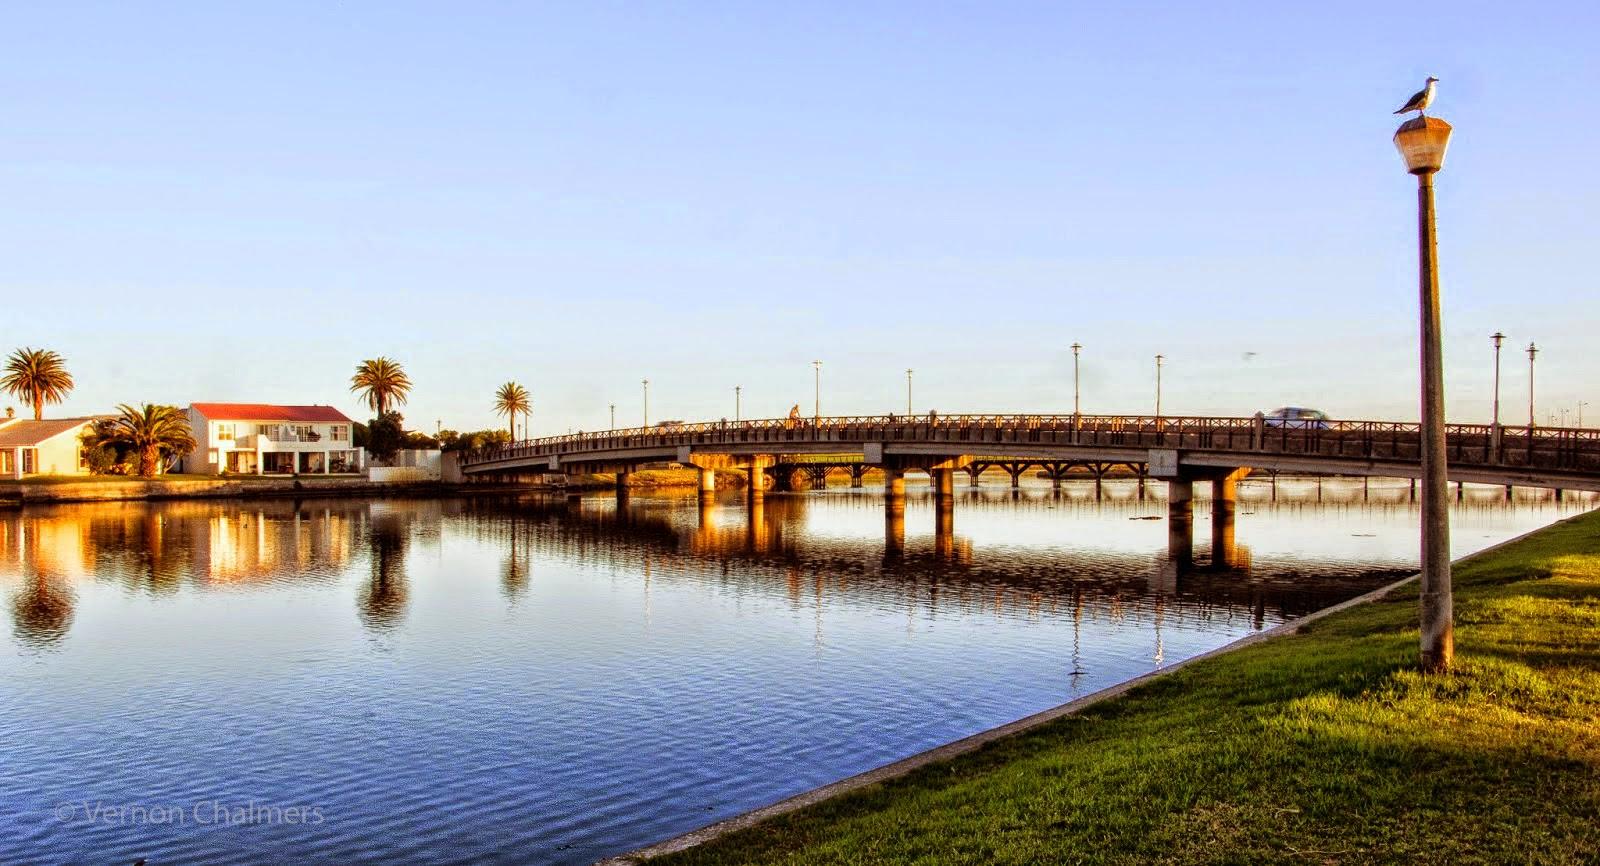 Copyright Vernon Chalmers: Main Bridge on Milnerton Lagoon